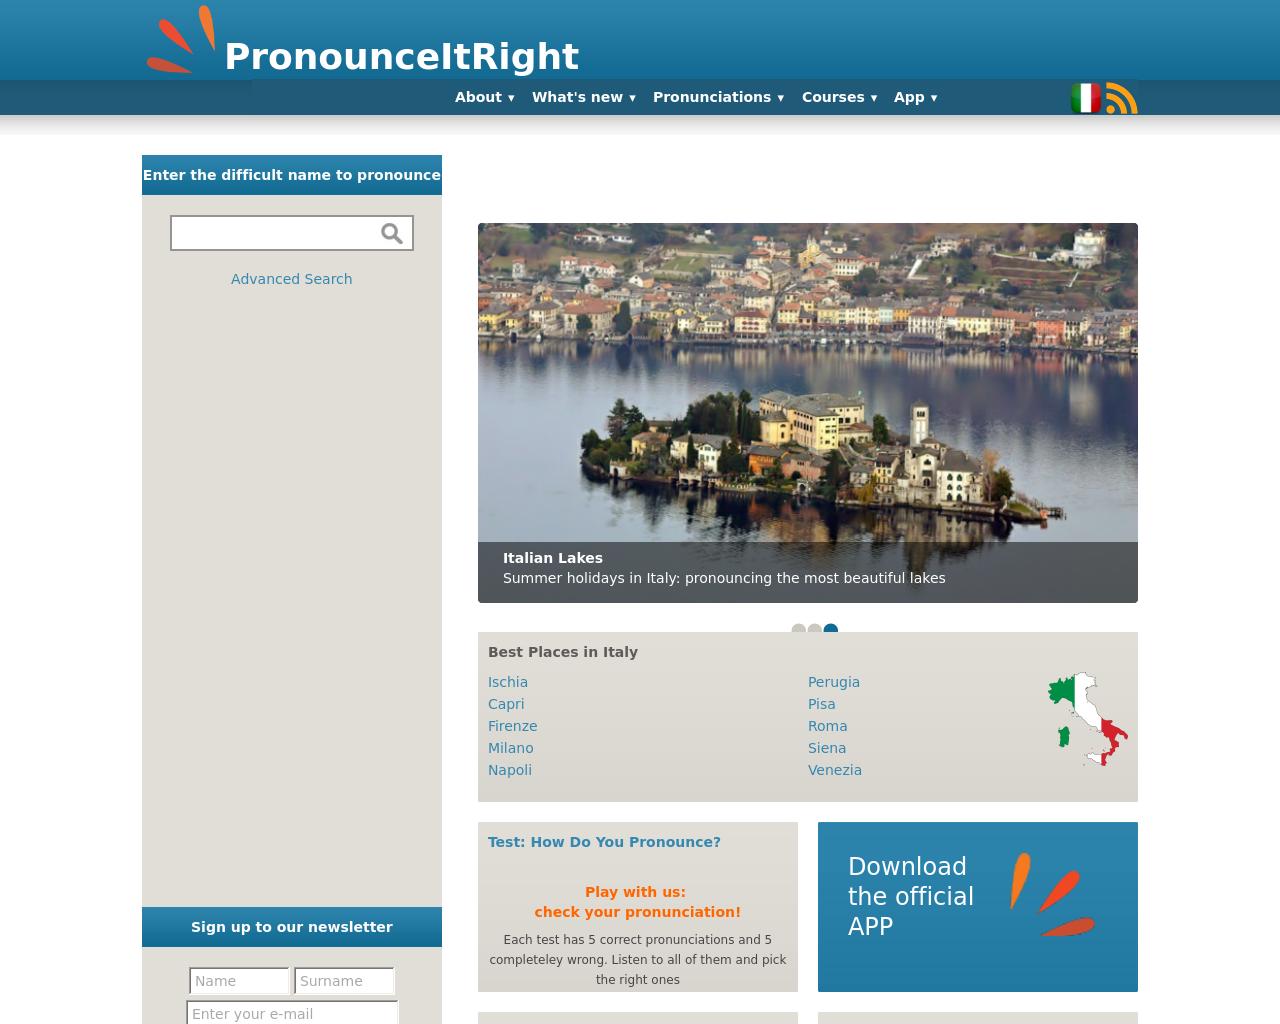 pronounceitright.com-Advertising-Reviews-Pricing